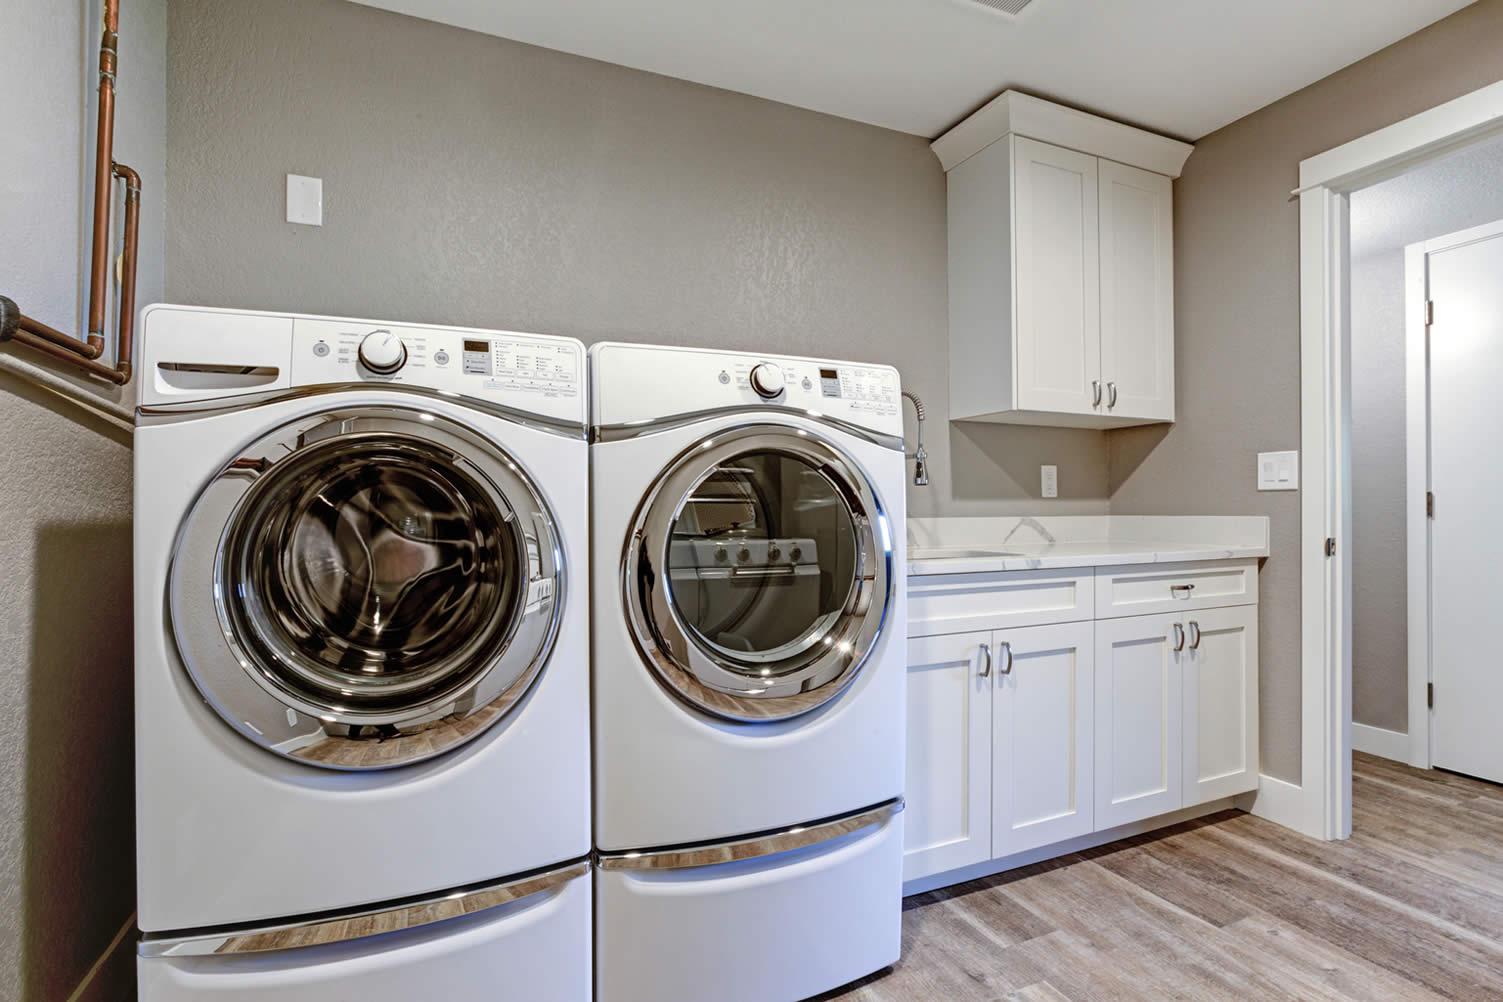 enhance appliance service life